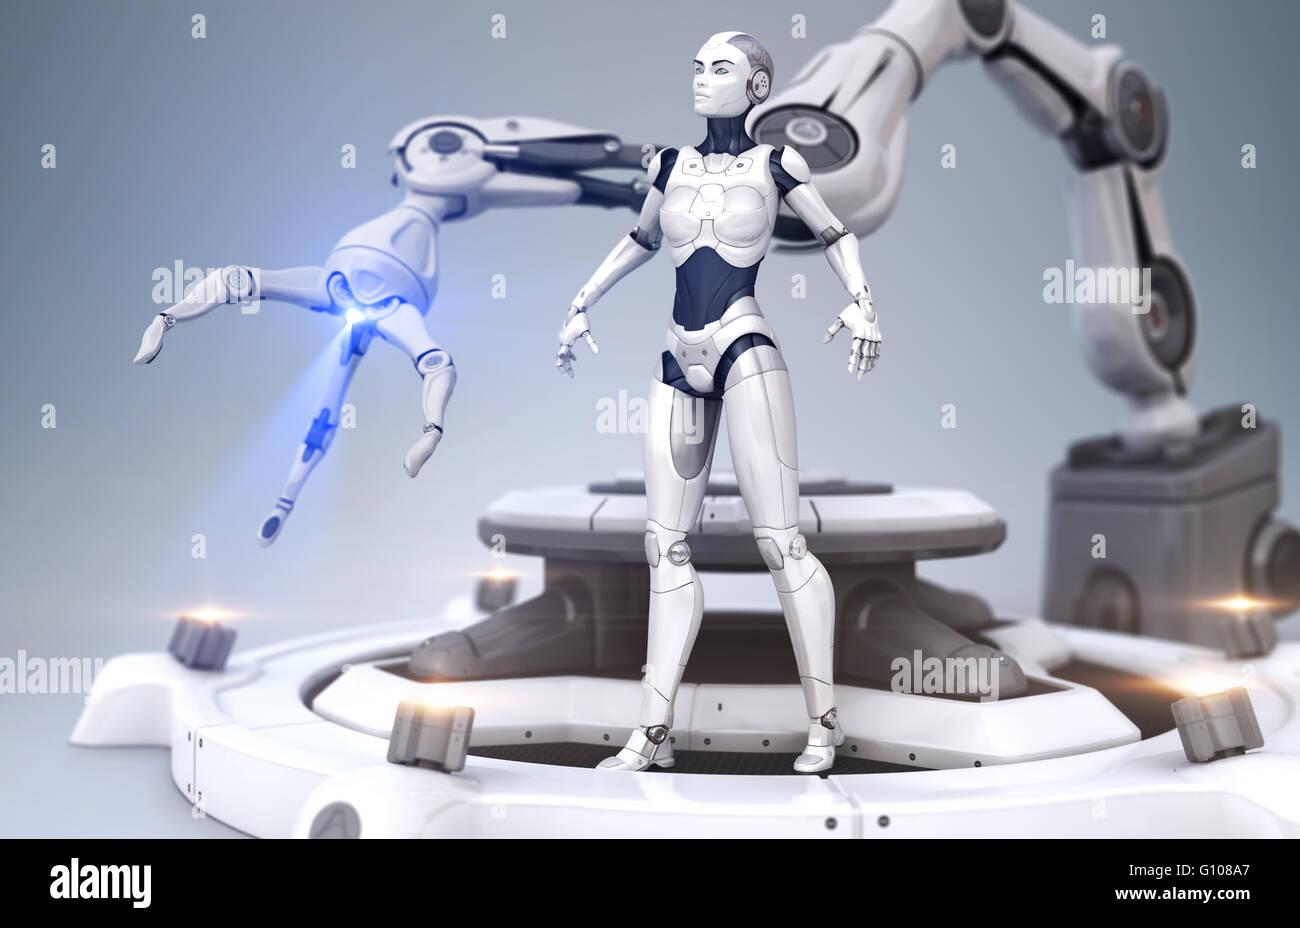 Sci-Fi-Roboter und Roboter-arm Stockbild